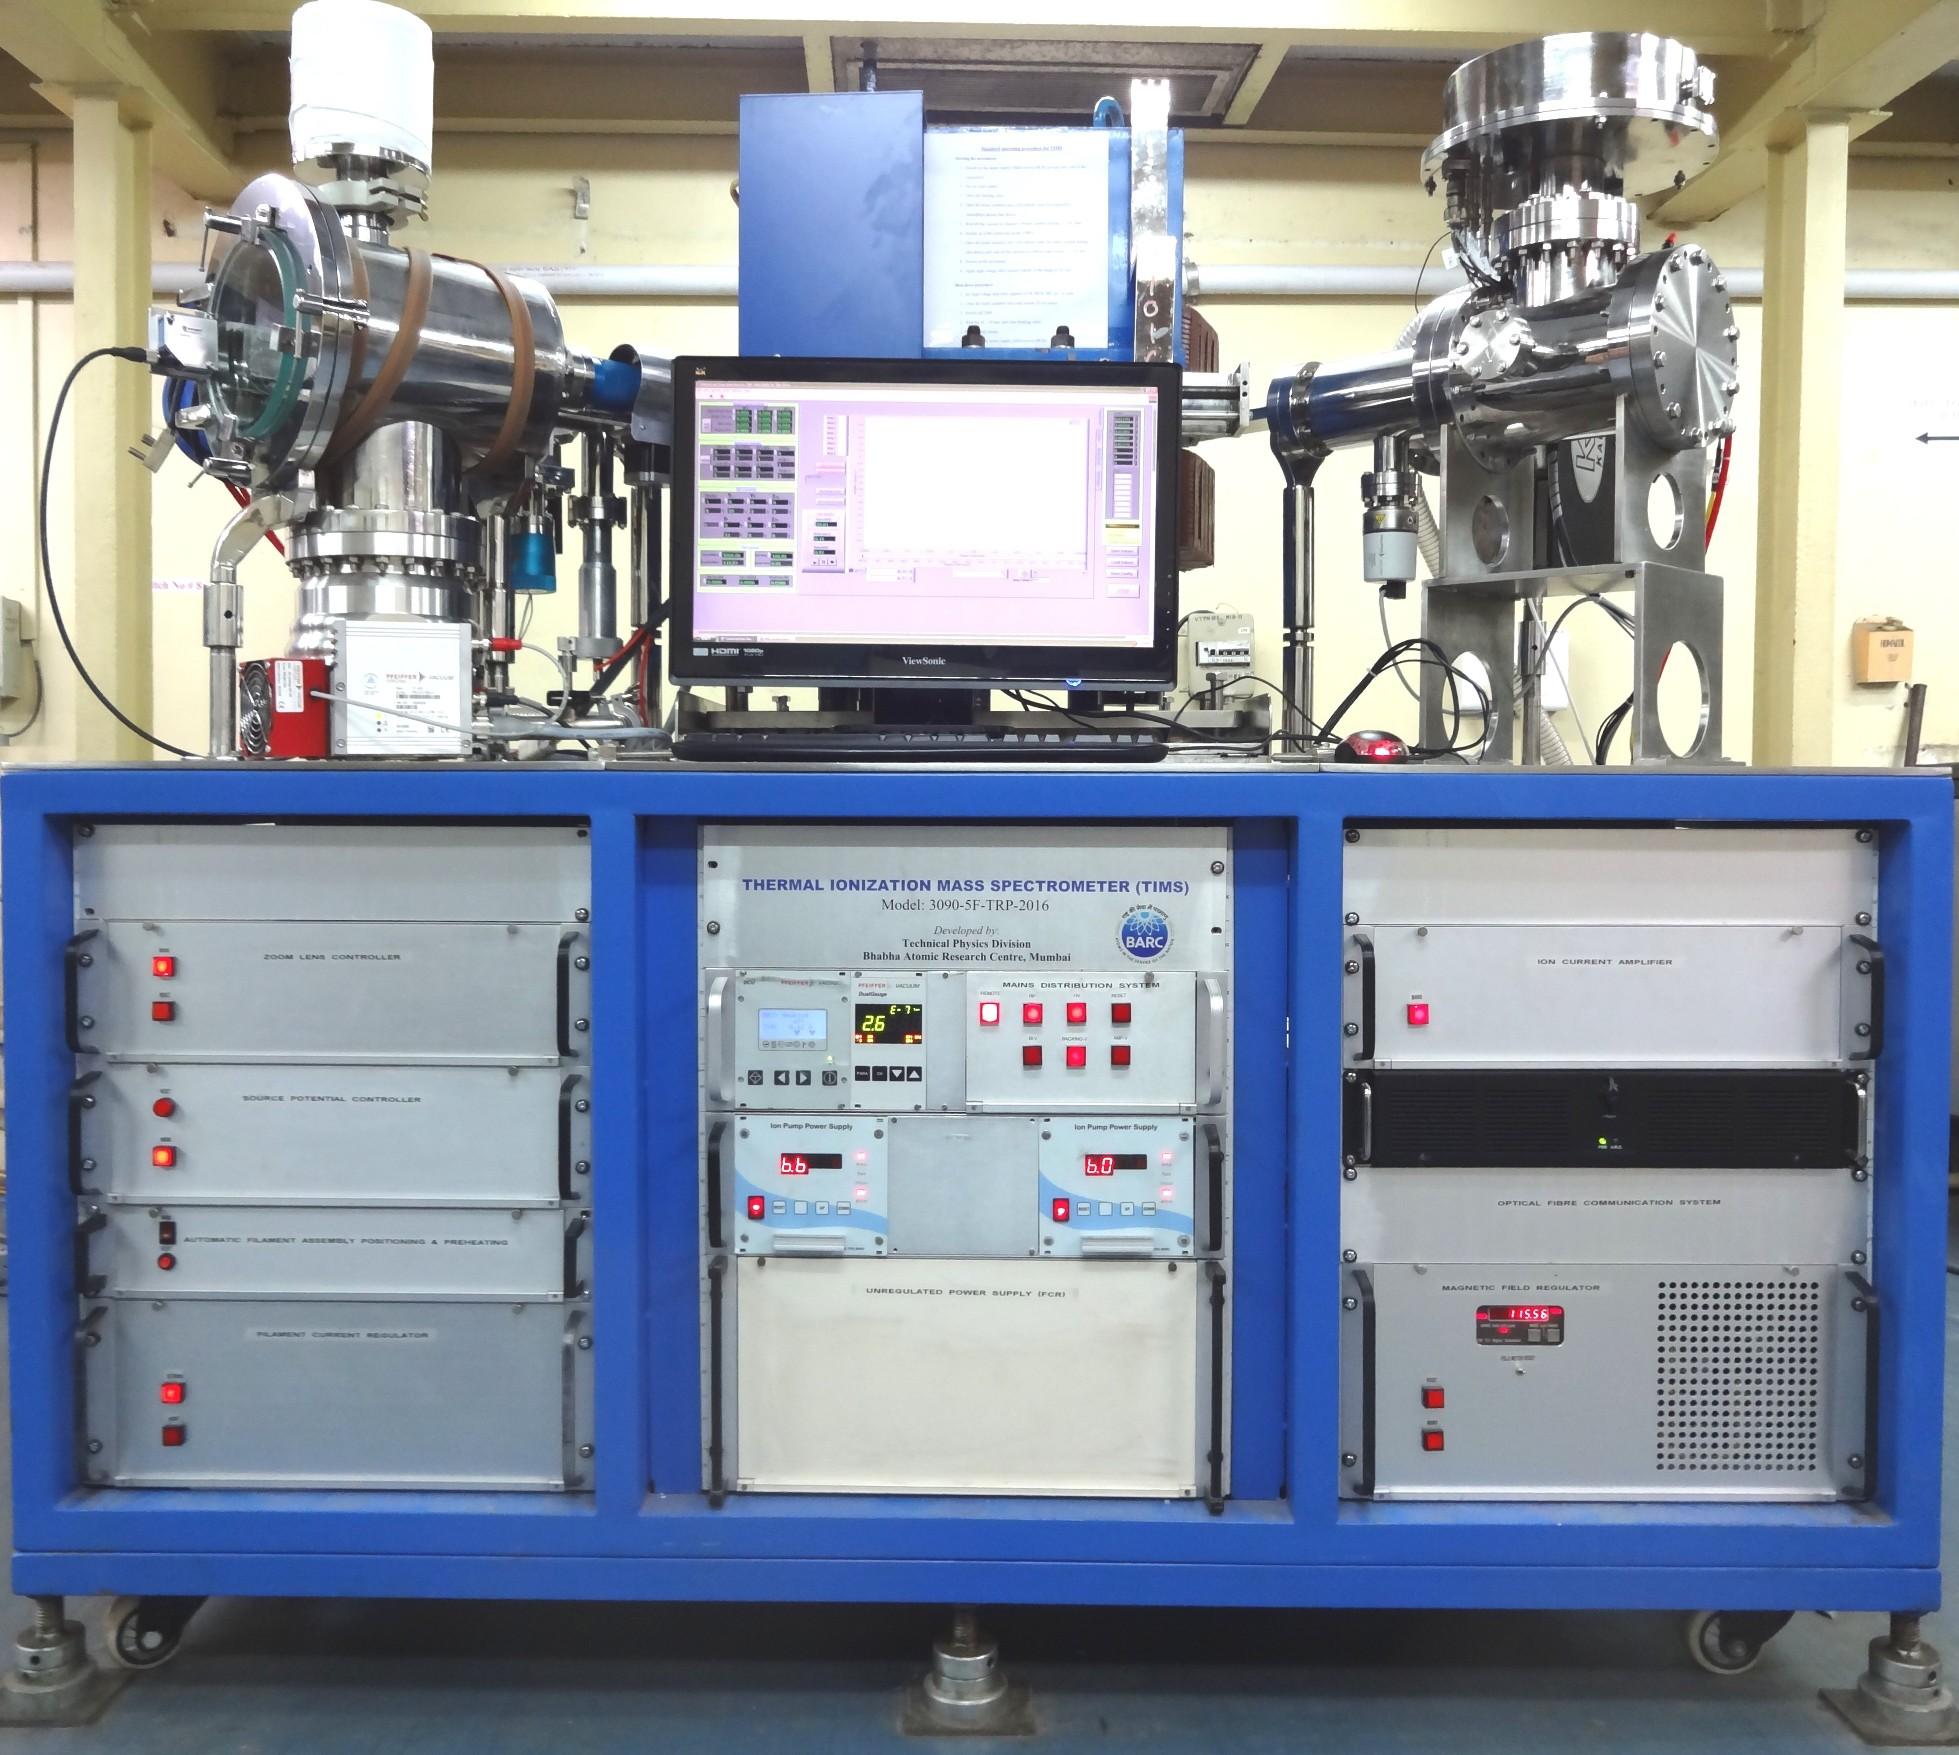 Thermal Ionization Mass Spectrometer